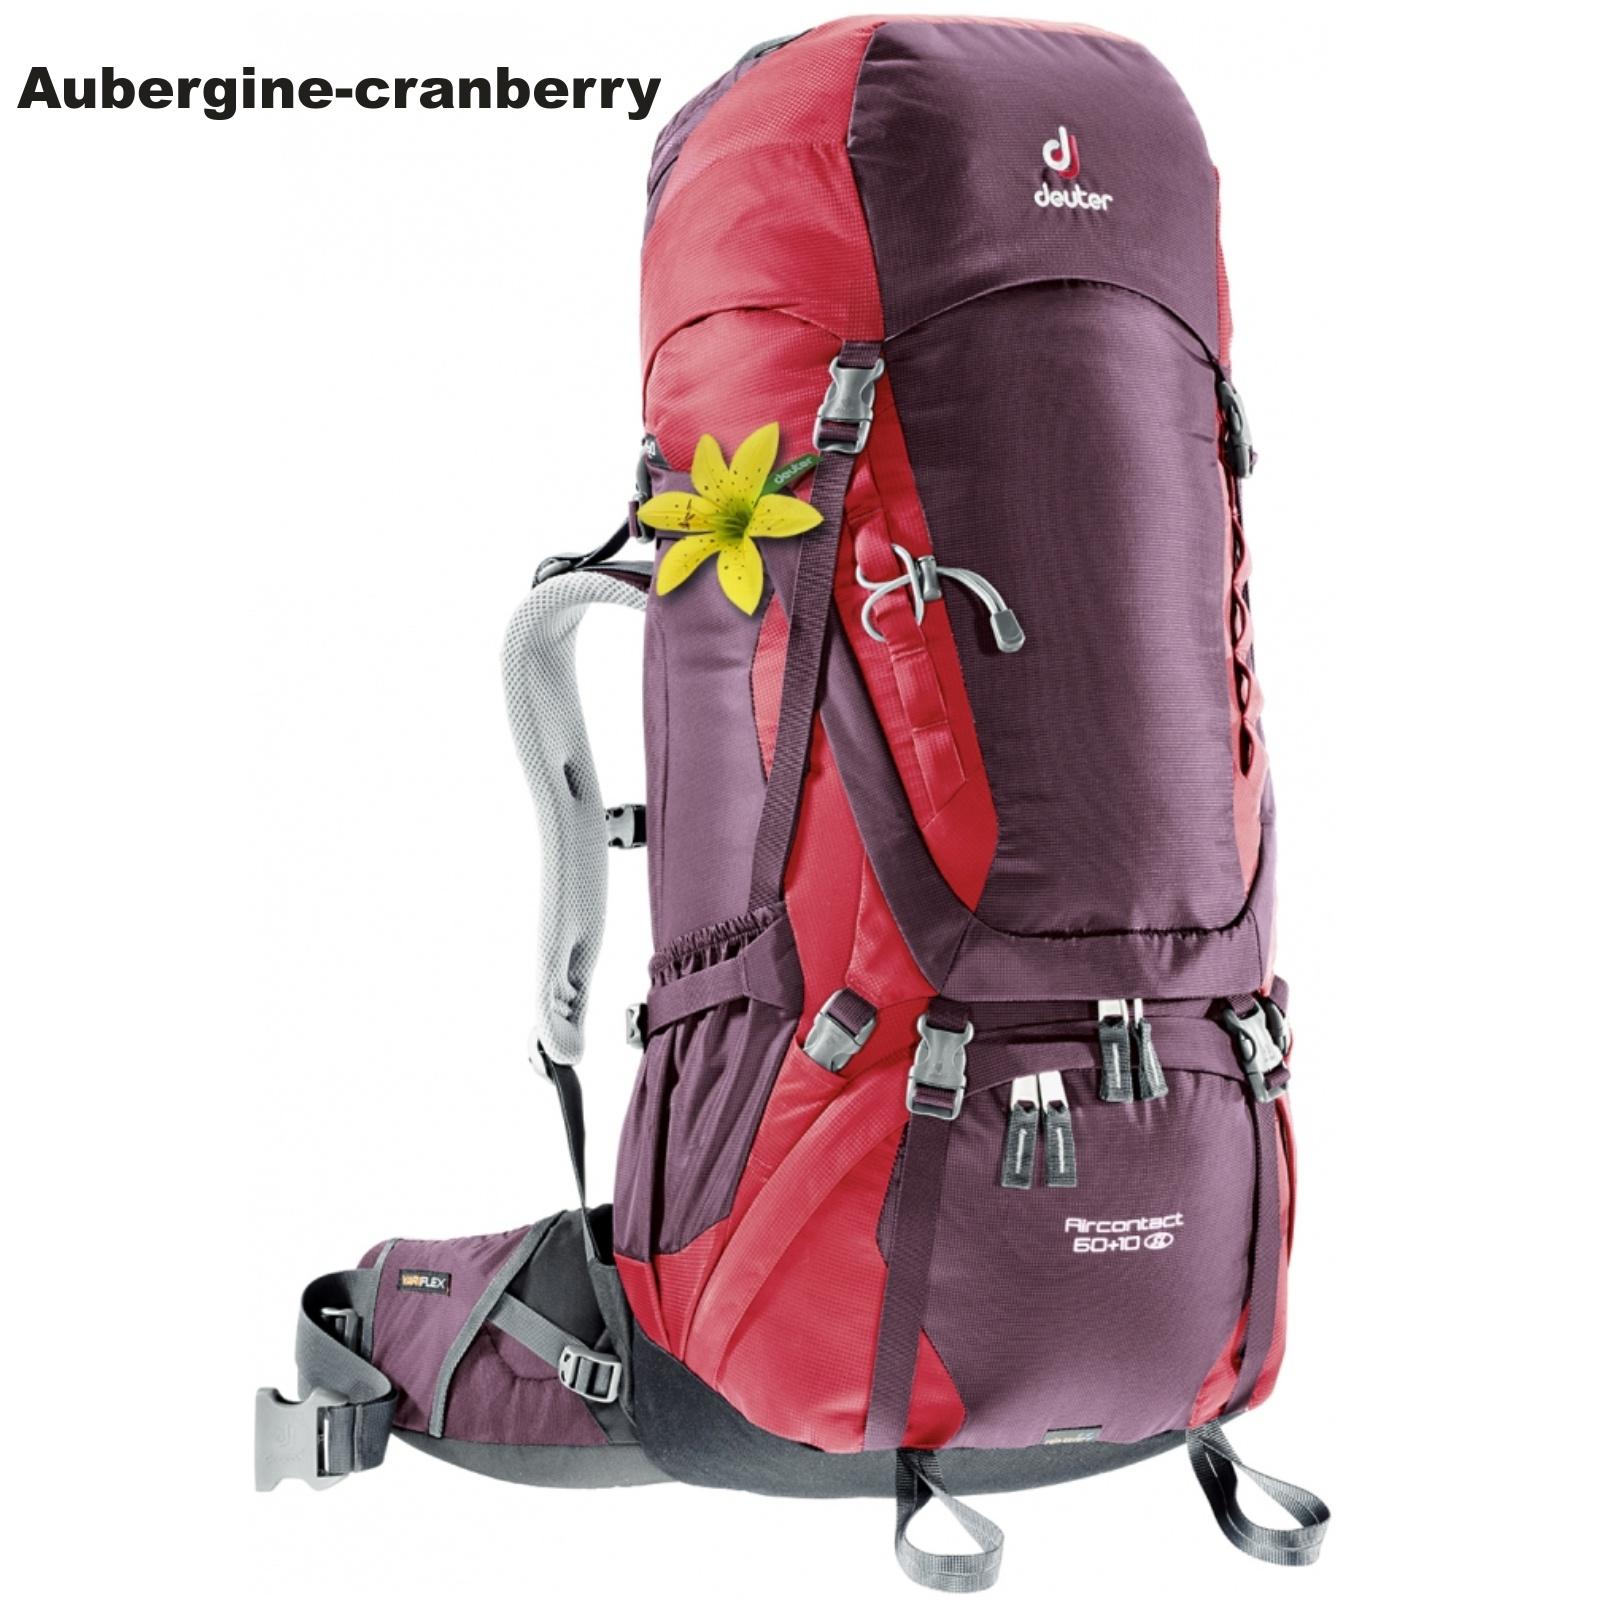 Batoh DEUTER Aircontact 60+10 SL - aubergine-cranberry